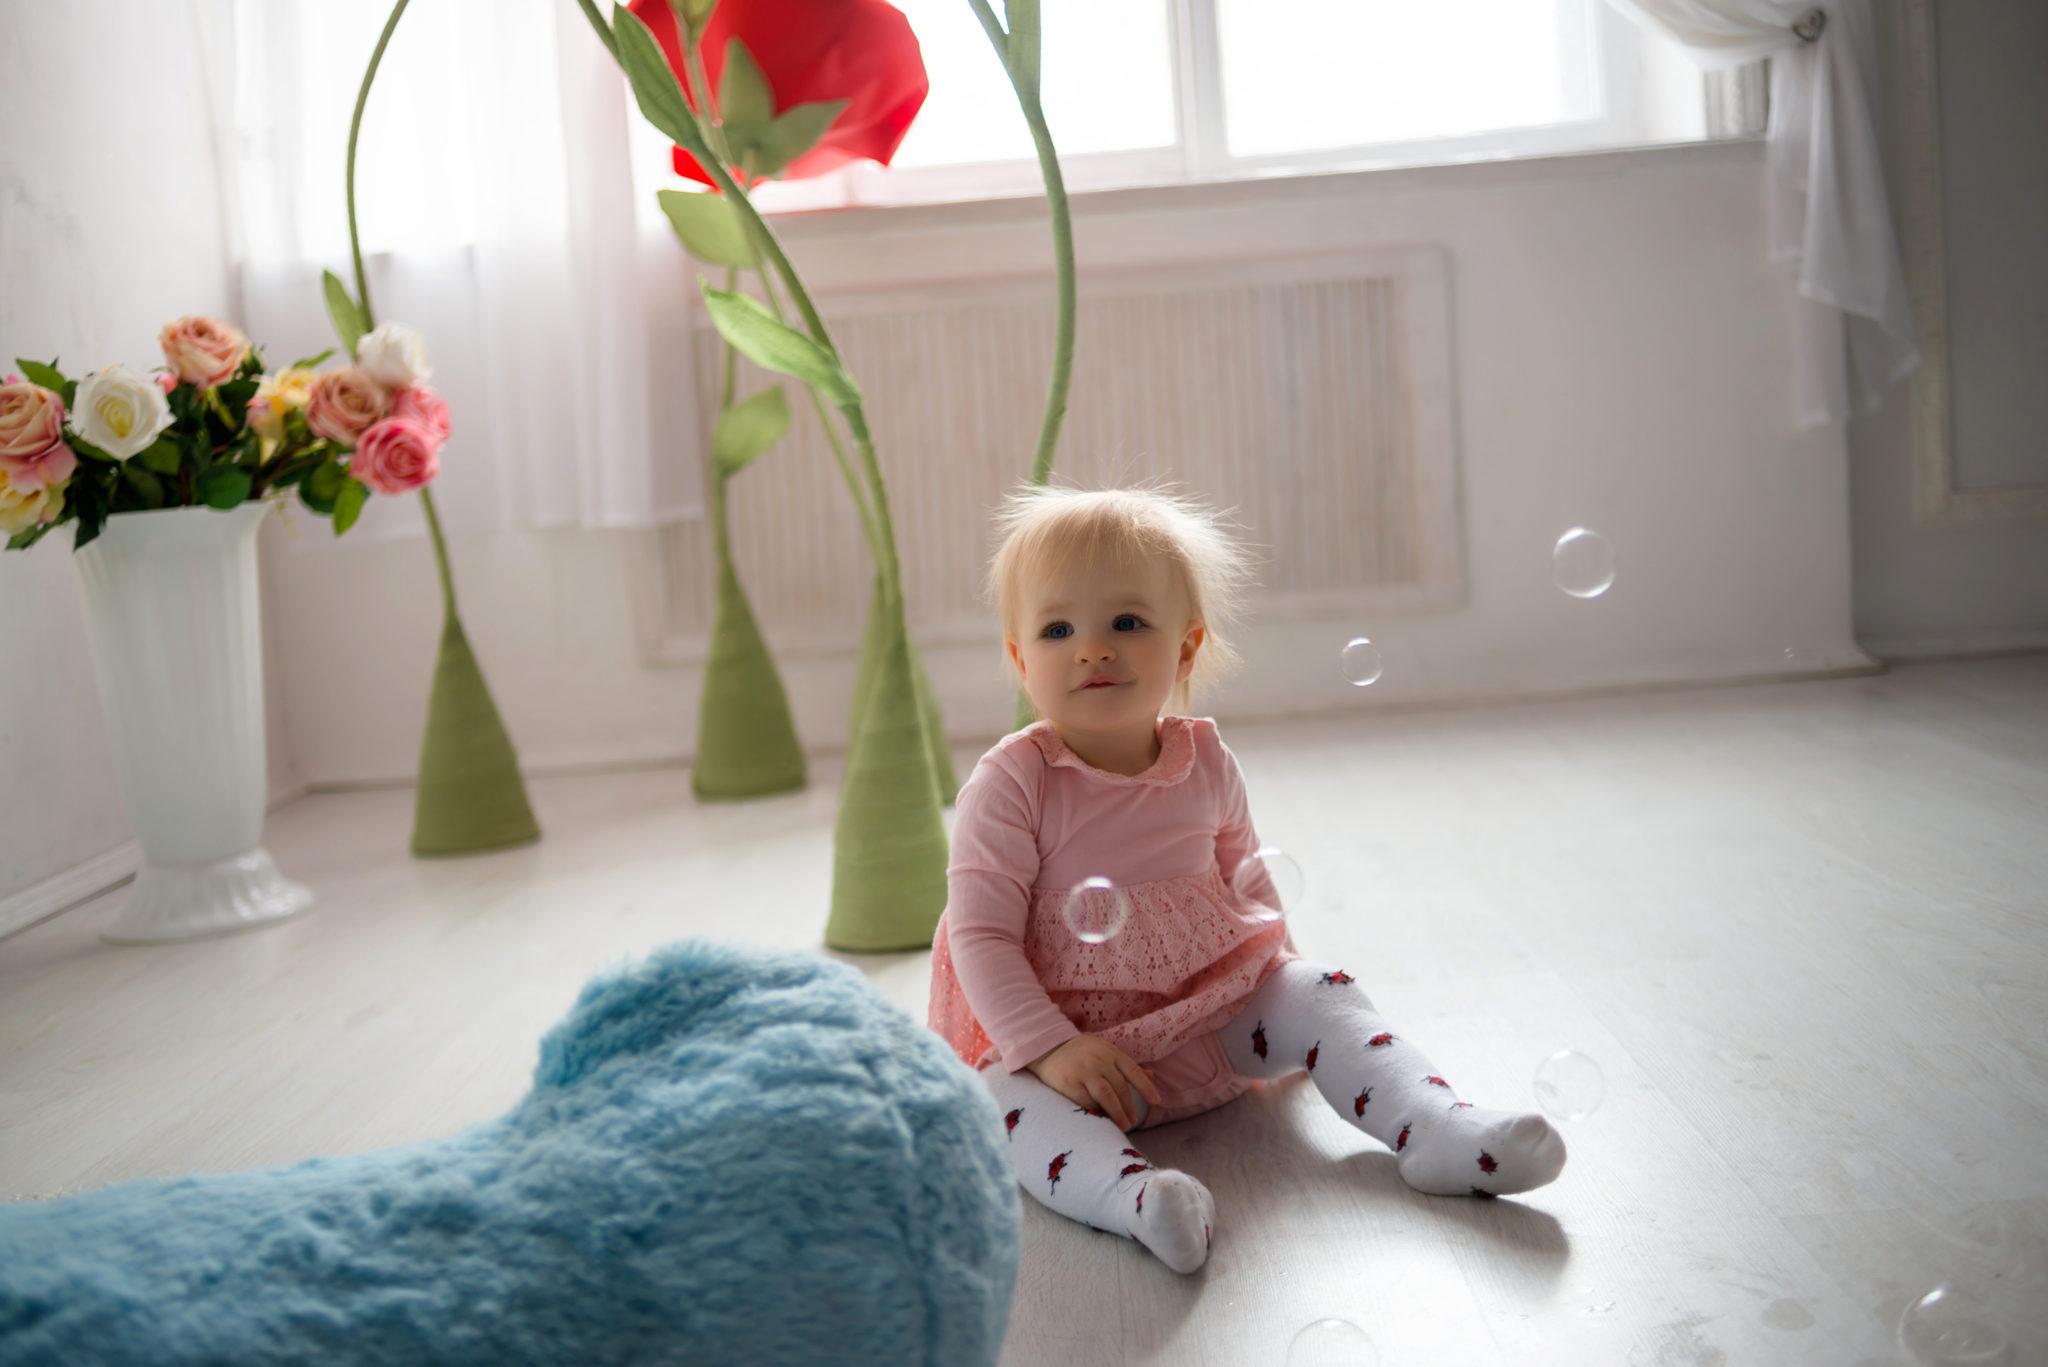 Детская фотосессия, ребенок сидит на полу на фоне цветов